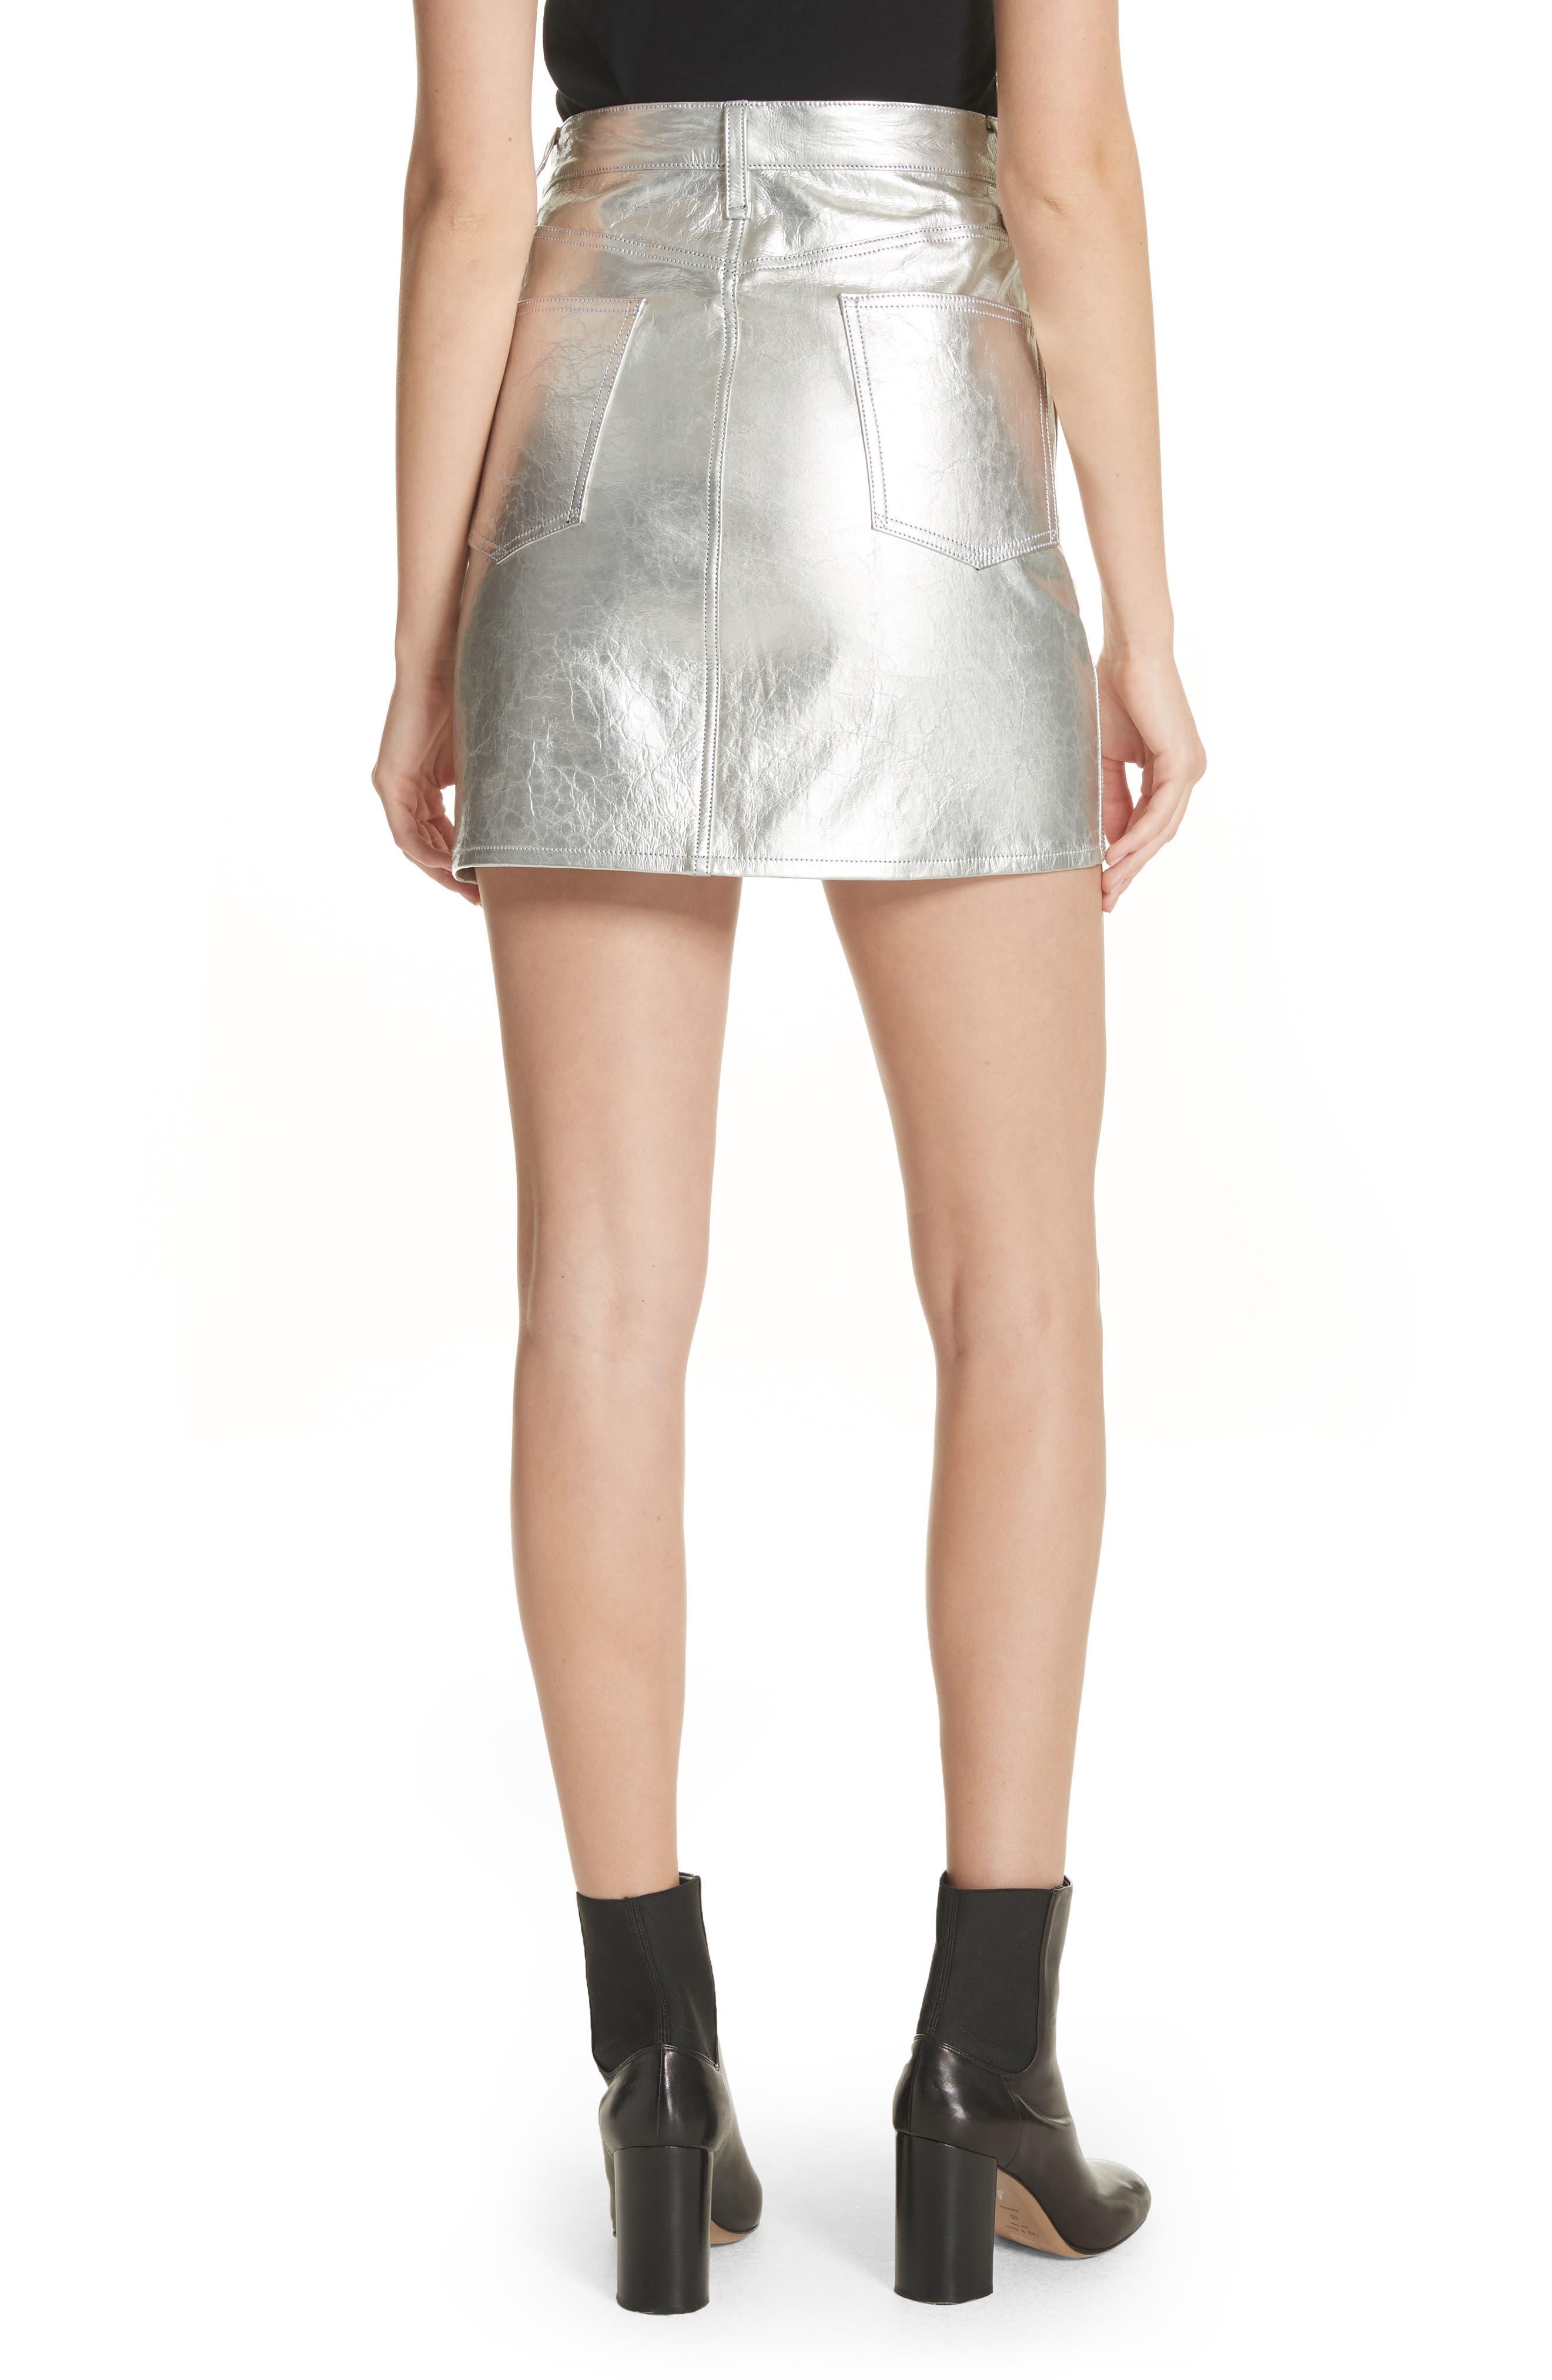 Moss High Waist Leather Miniskirt,                             Alternate thumbnail 2, color,                             Metallic